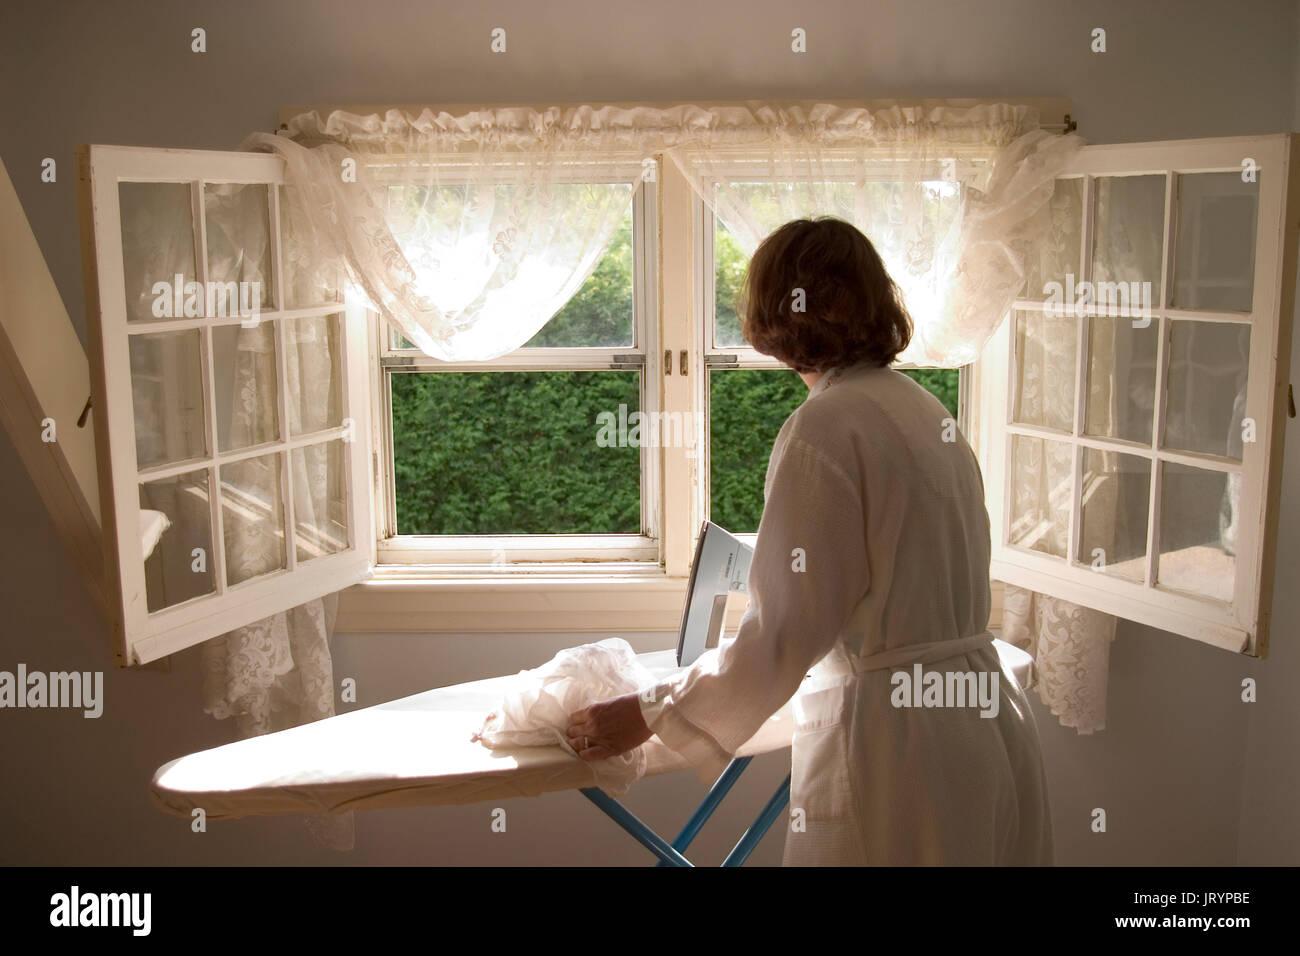 Ironing and house chores. - Stock Image